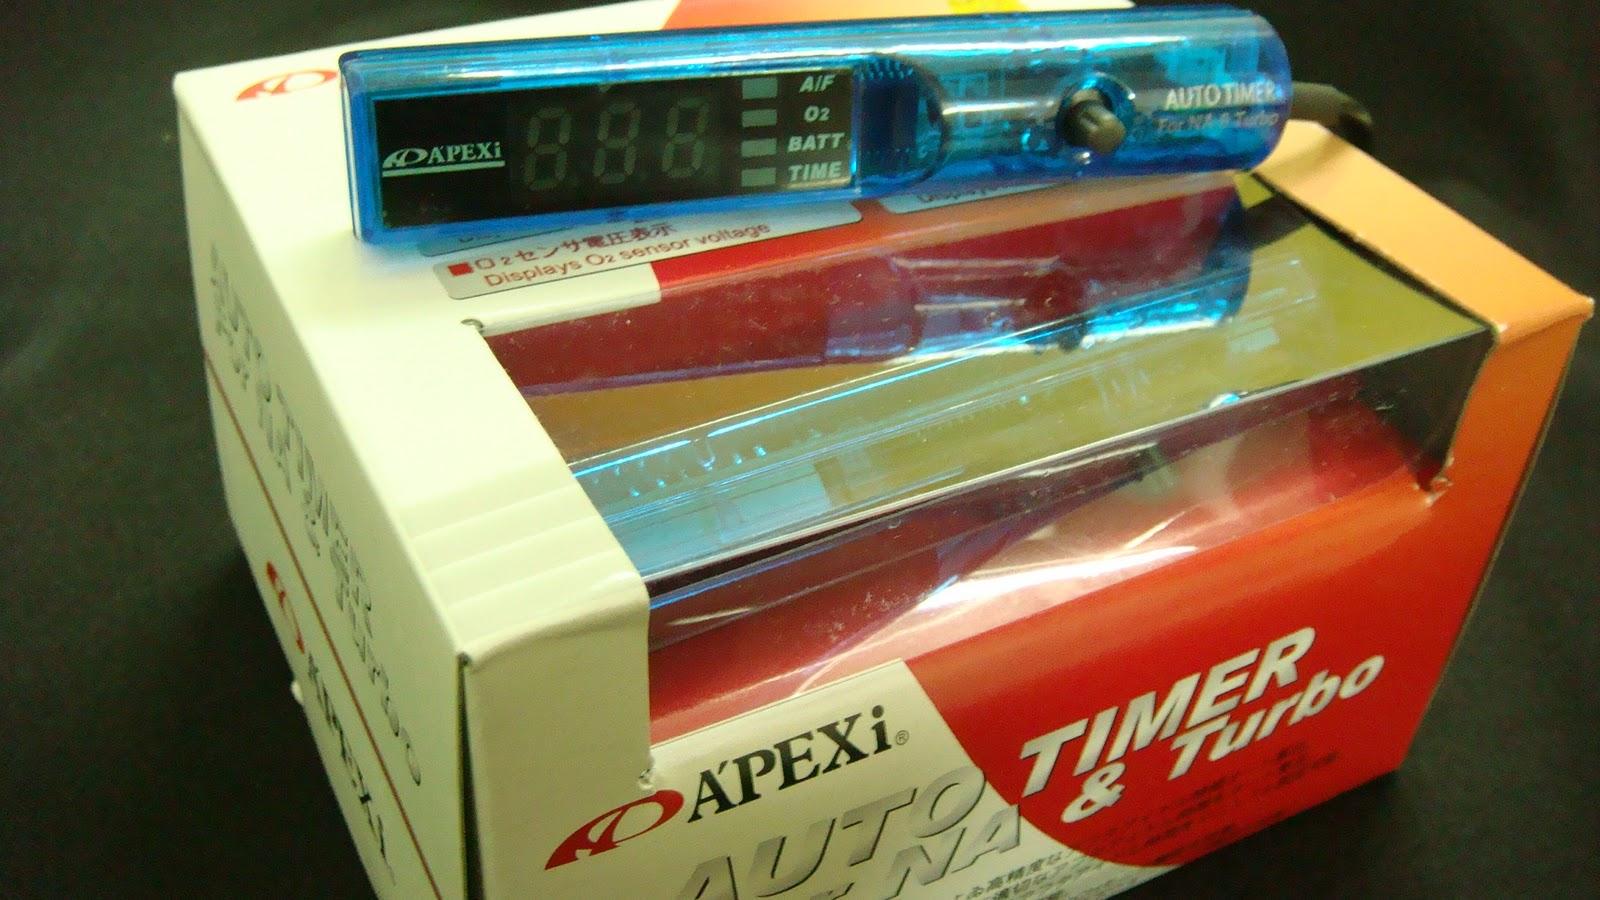 Apexi Pen Turbo Timer Wiring Diagram Orbital Interaction For Molecular Formation Skatuner Auto Parts